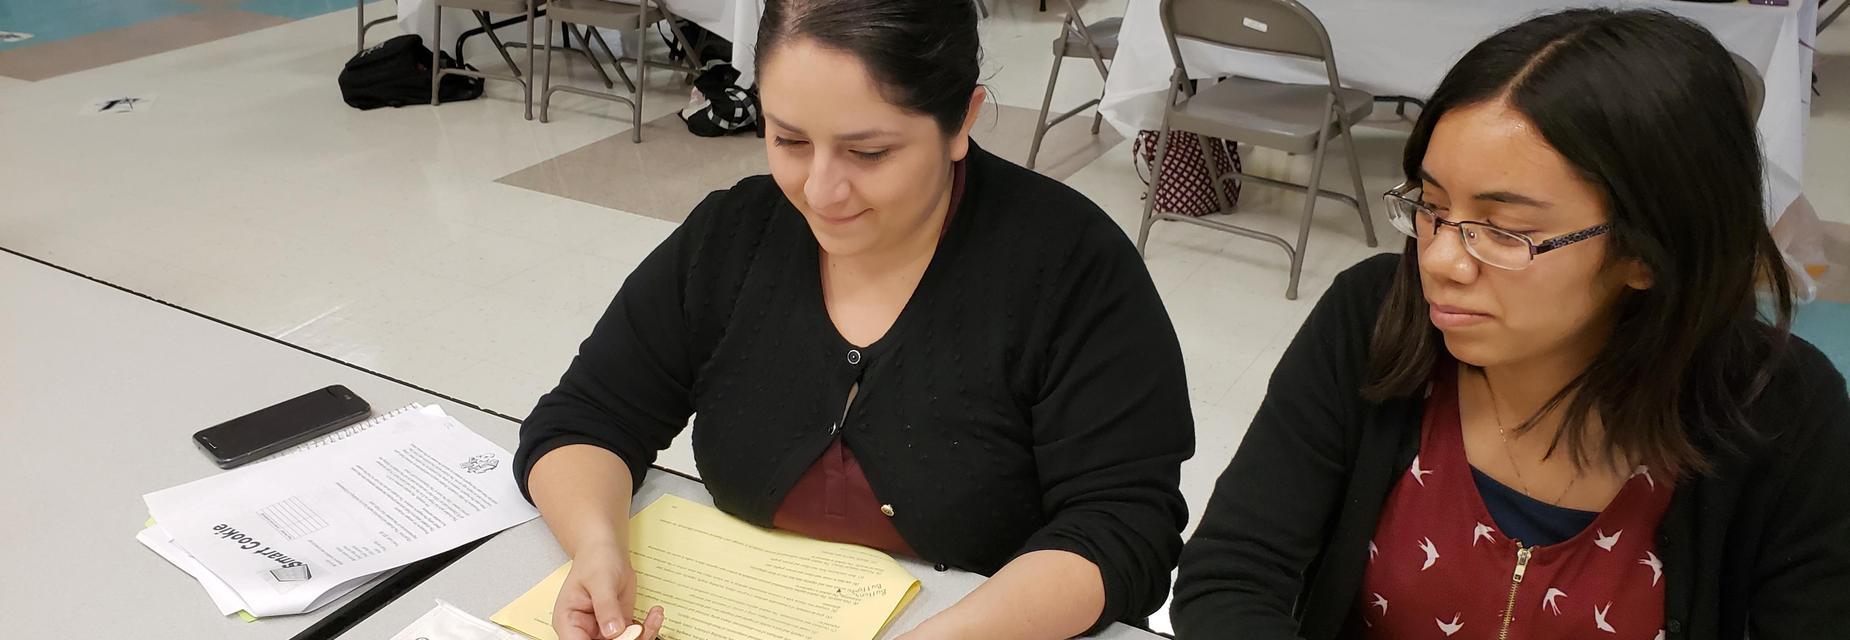 staff training on utilizing centers